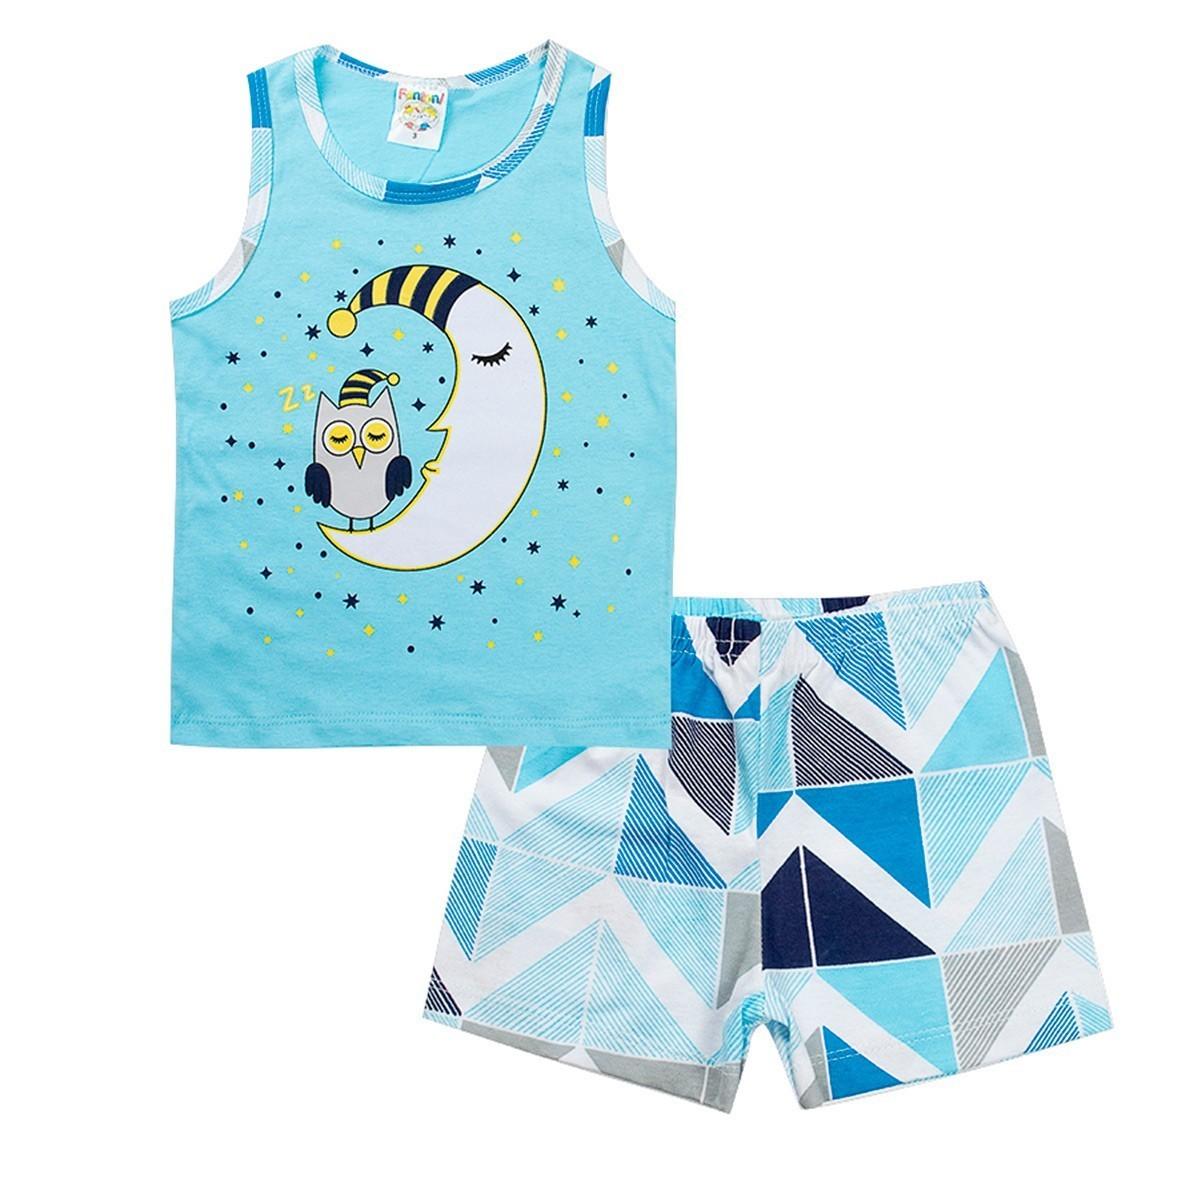 Conjunto Pijama Infantil Menino Brilha No Escuro Regata Azul